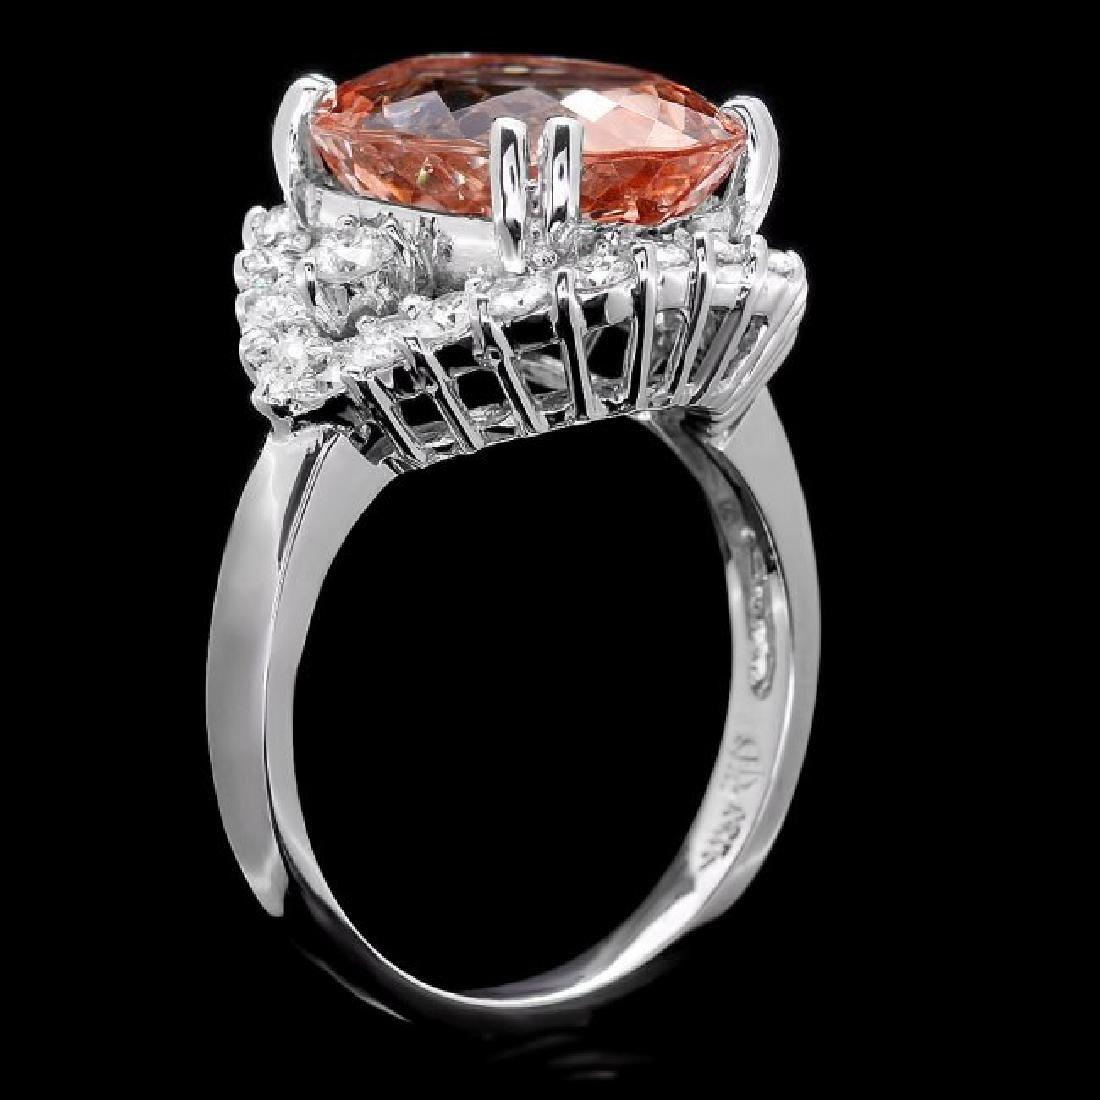 14k Gold 6.00ct Morganite 1.00ct Diamond Ring - 2